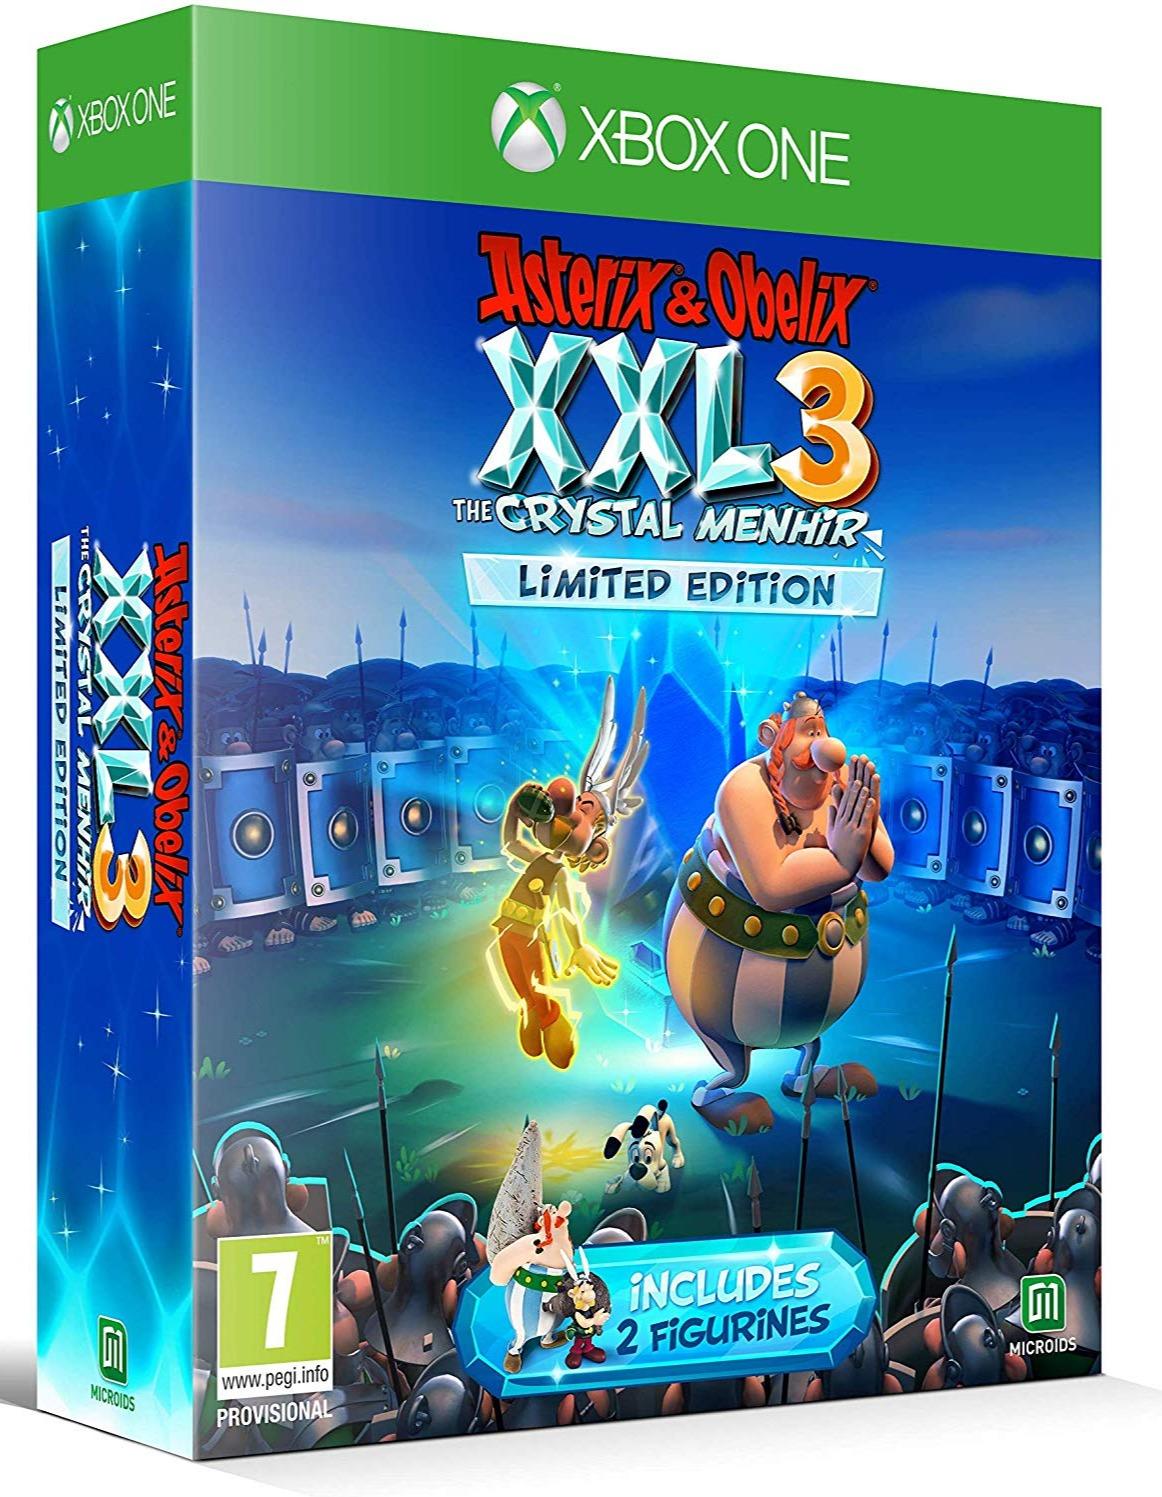 Asterix & Obelix XXL 3: The Crystal Menhir - Limited Edition (XONE)